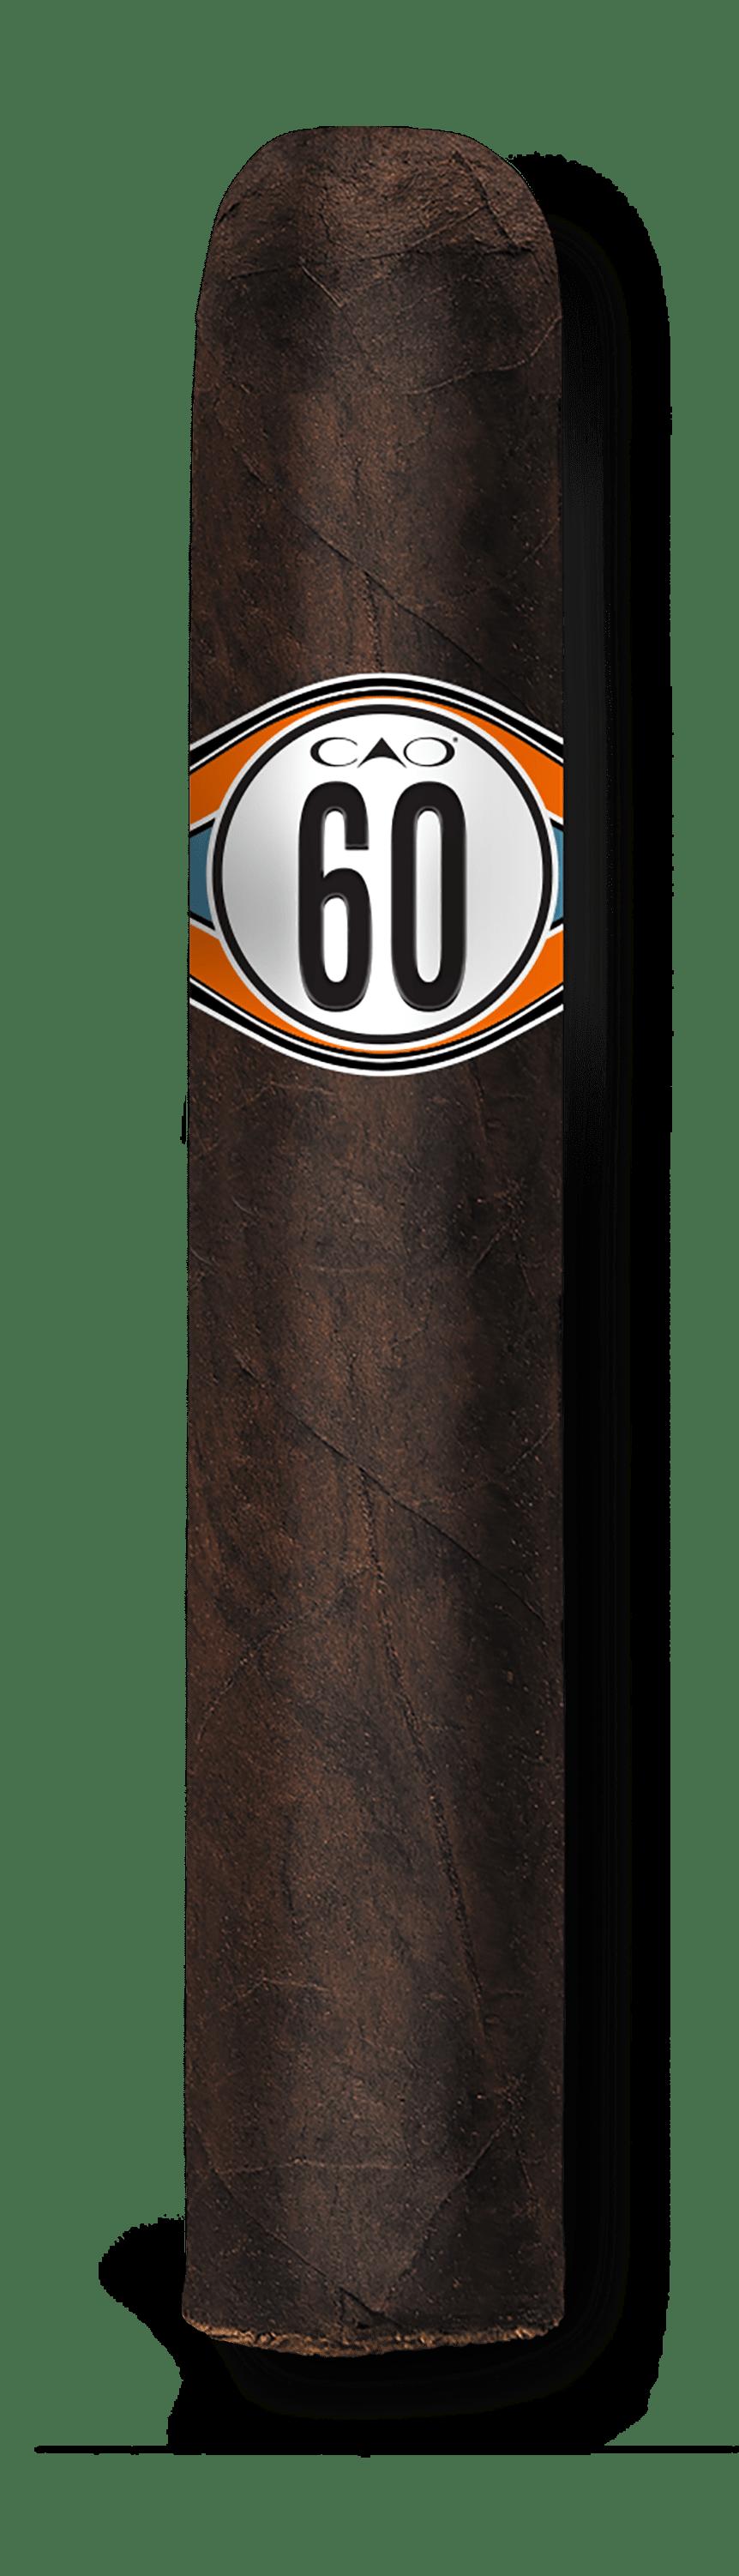 CAO 60 TORQUE_cigar